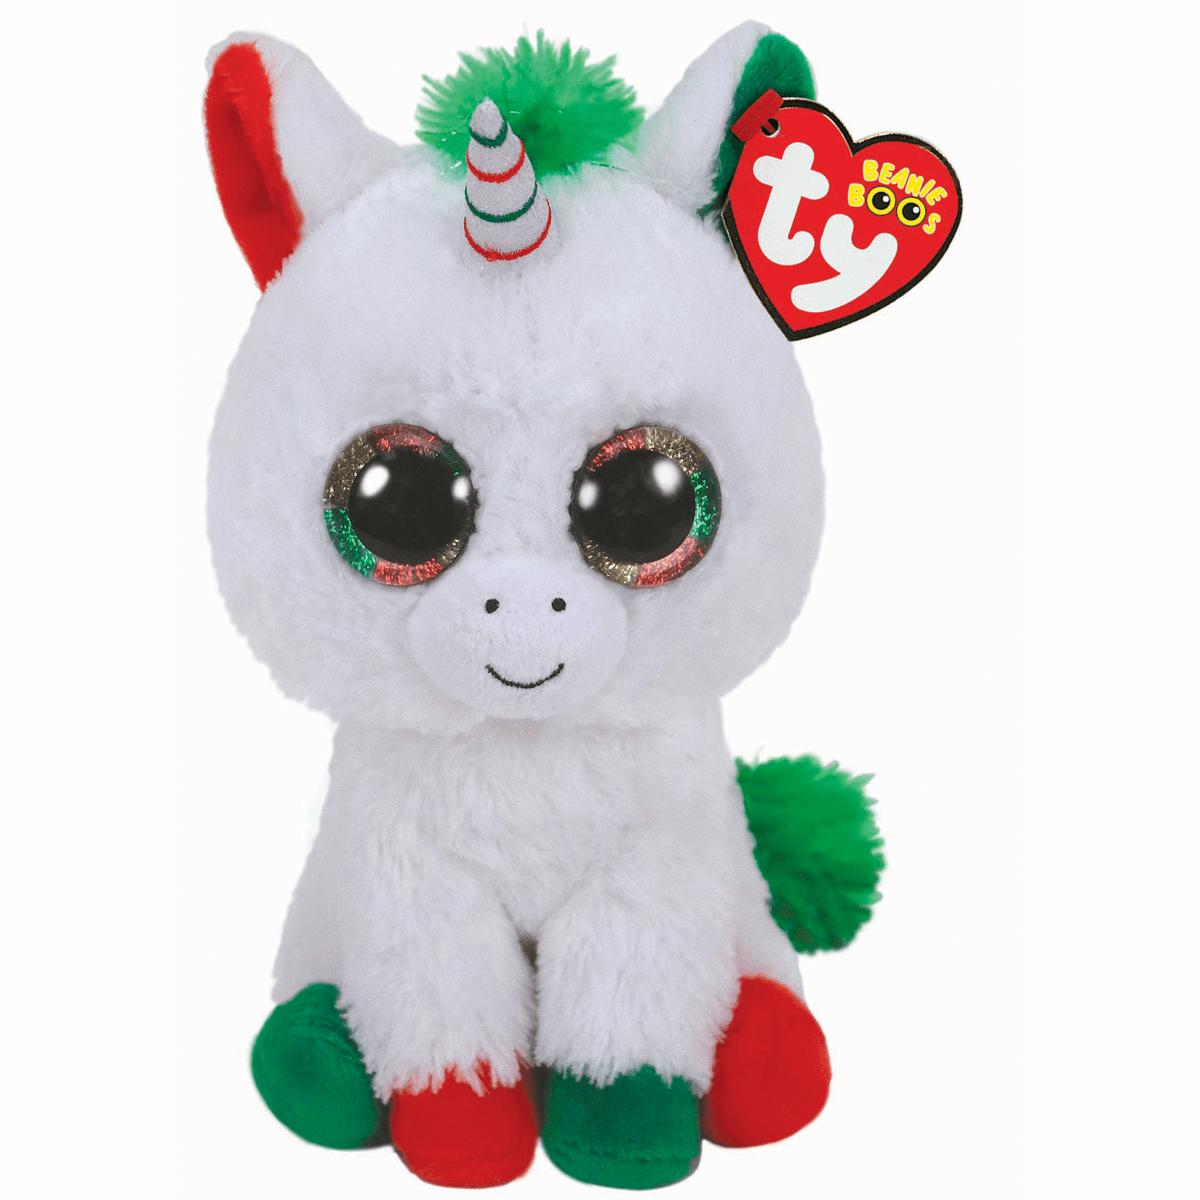 Ty Christmas 2018 Beanie Boo - Candy Cane  ed44b85c75f